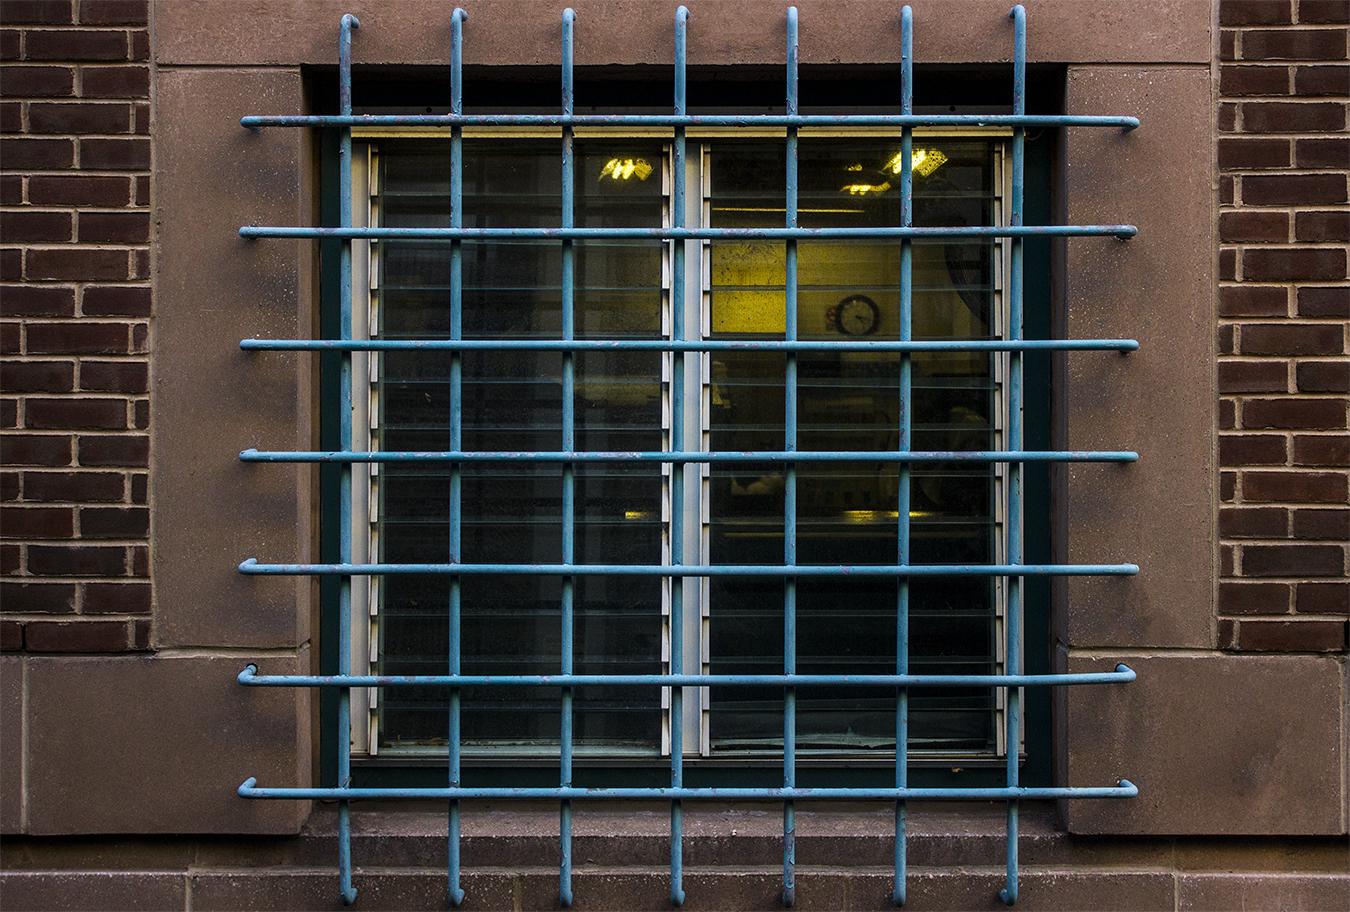 Yash Killa_StillLife_Philadelphia_Pattern_Repetition_Window_Room_Grill_Bars_Colours_Order_Structure